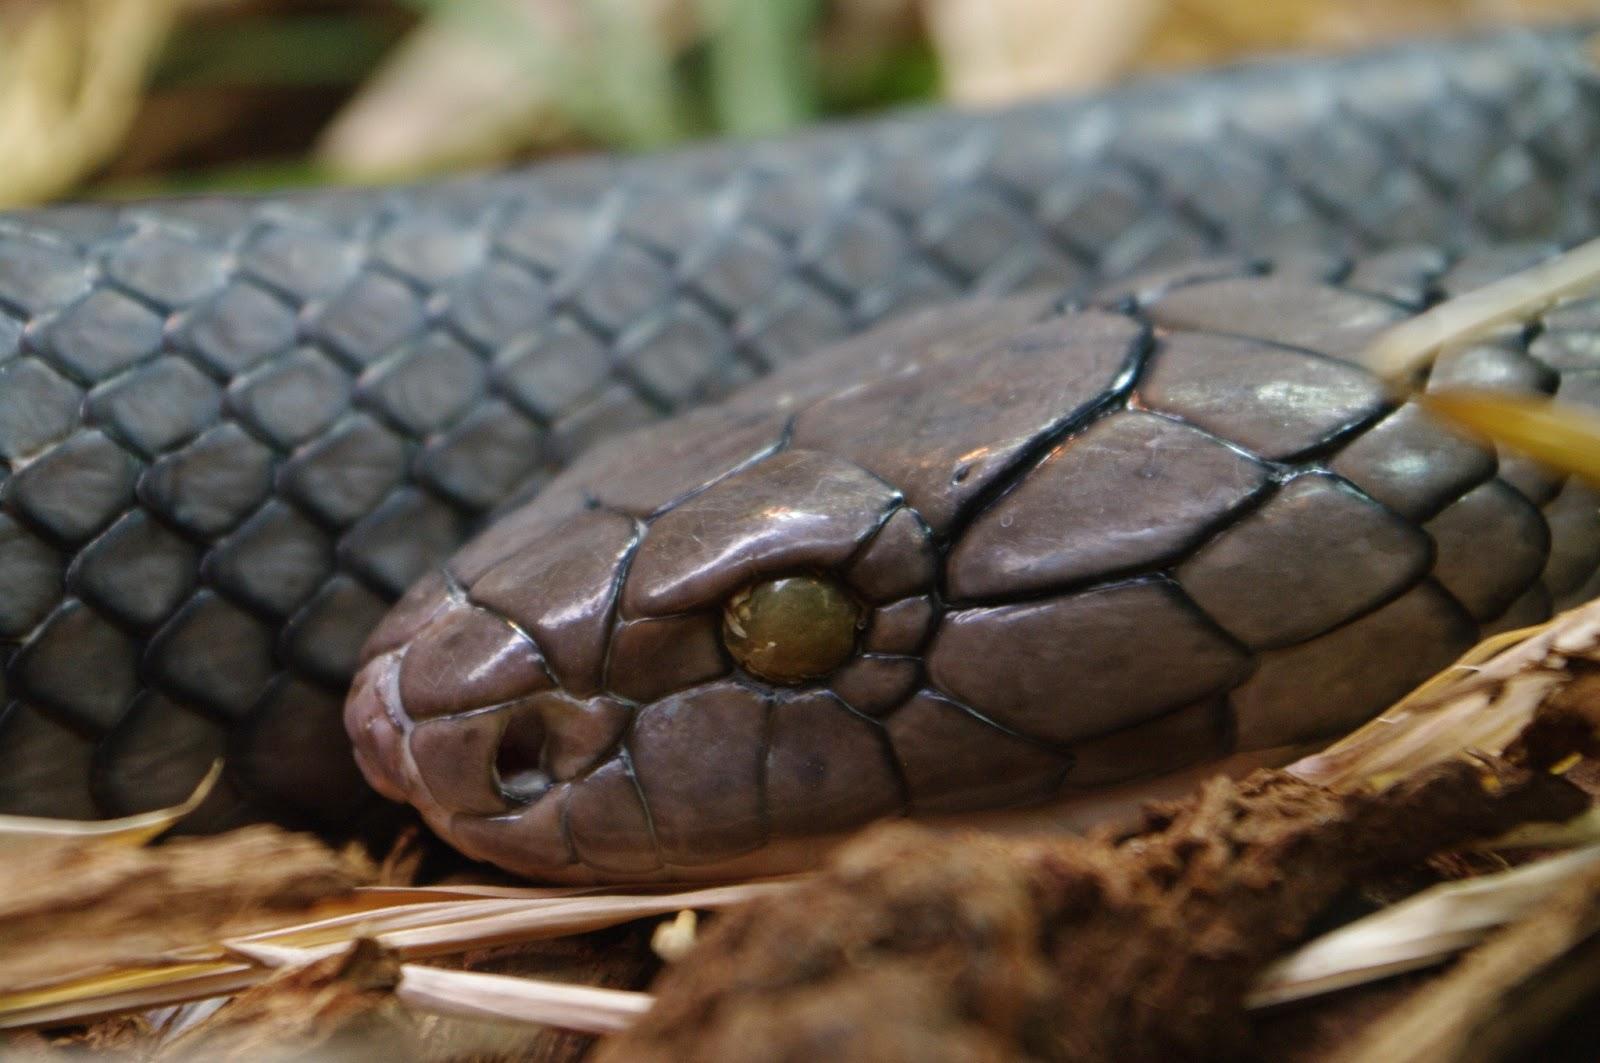 King Cobra Snake Photos: The King Cobra Snake Interesting Information & Pictures